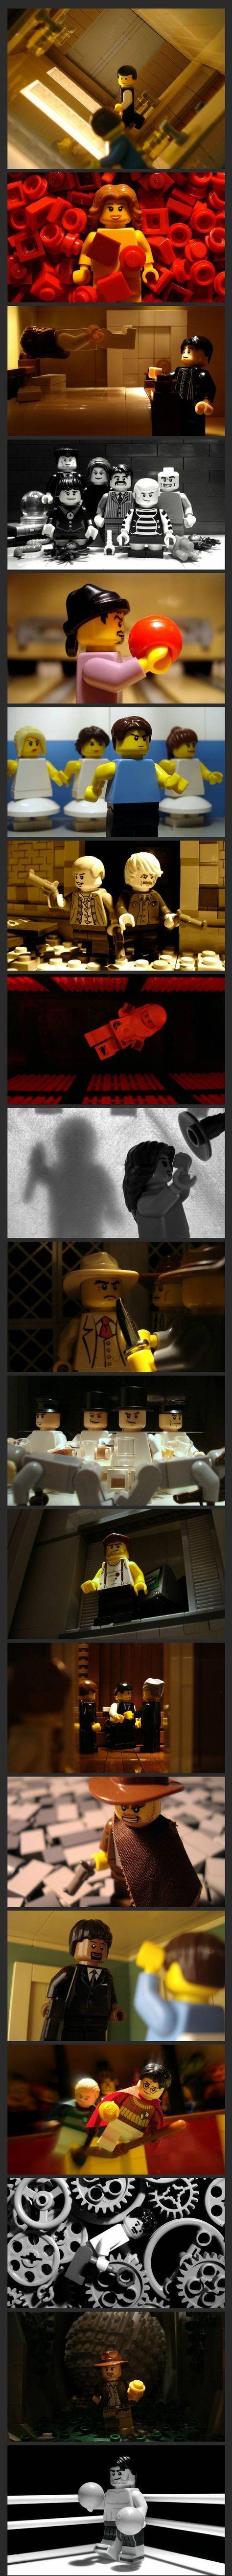 Lego movie scenes